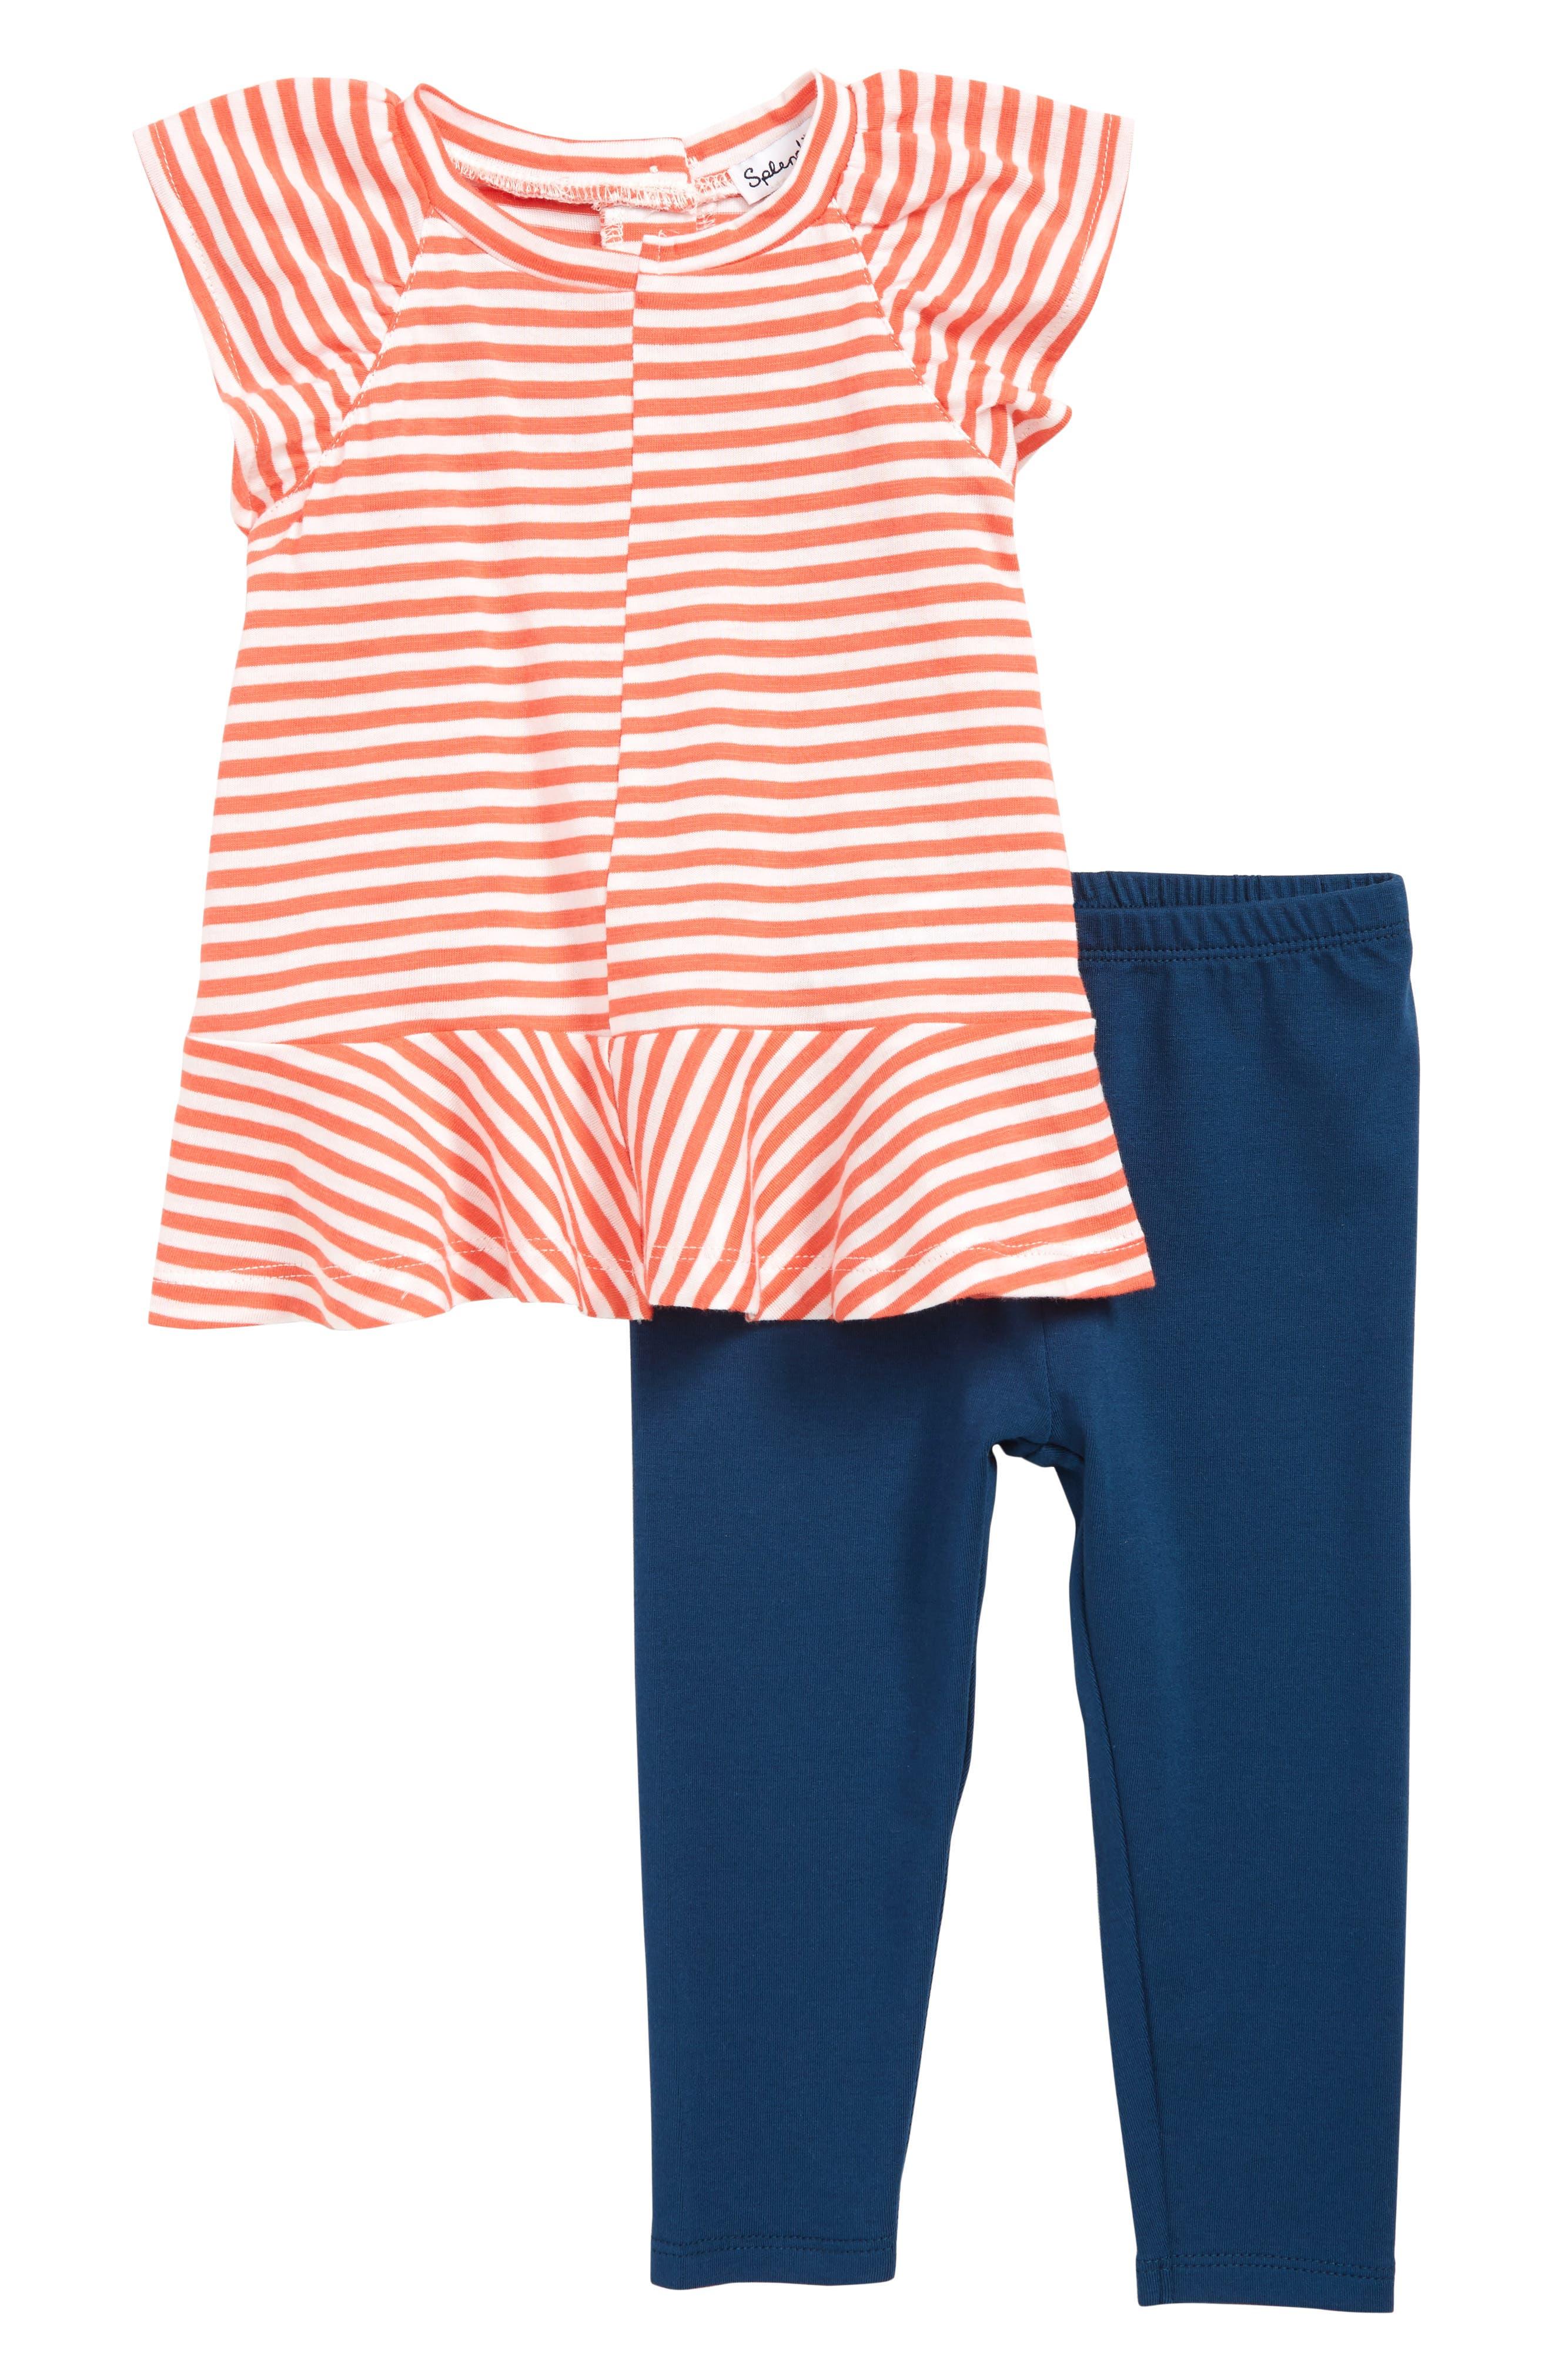 SPLENDID Stripe Peplum T-Shirt & Leggings Set, Main, color, CORAL LIPSTICK